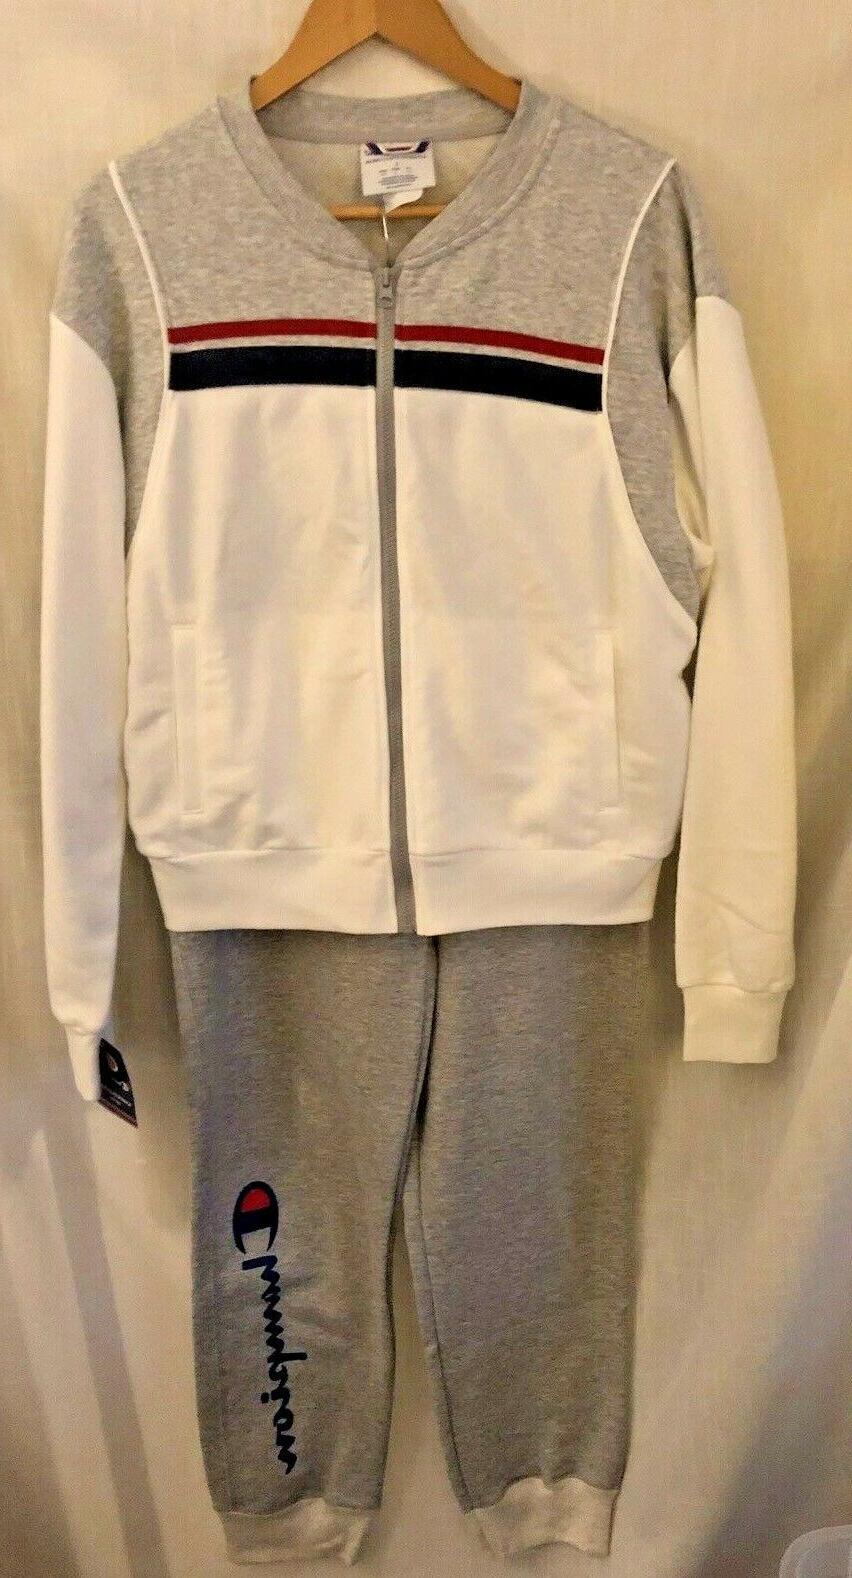 heritage fleece sweat suit oxford grey oatmeal